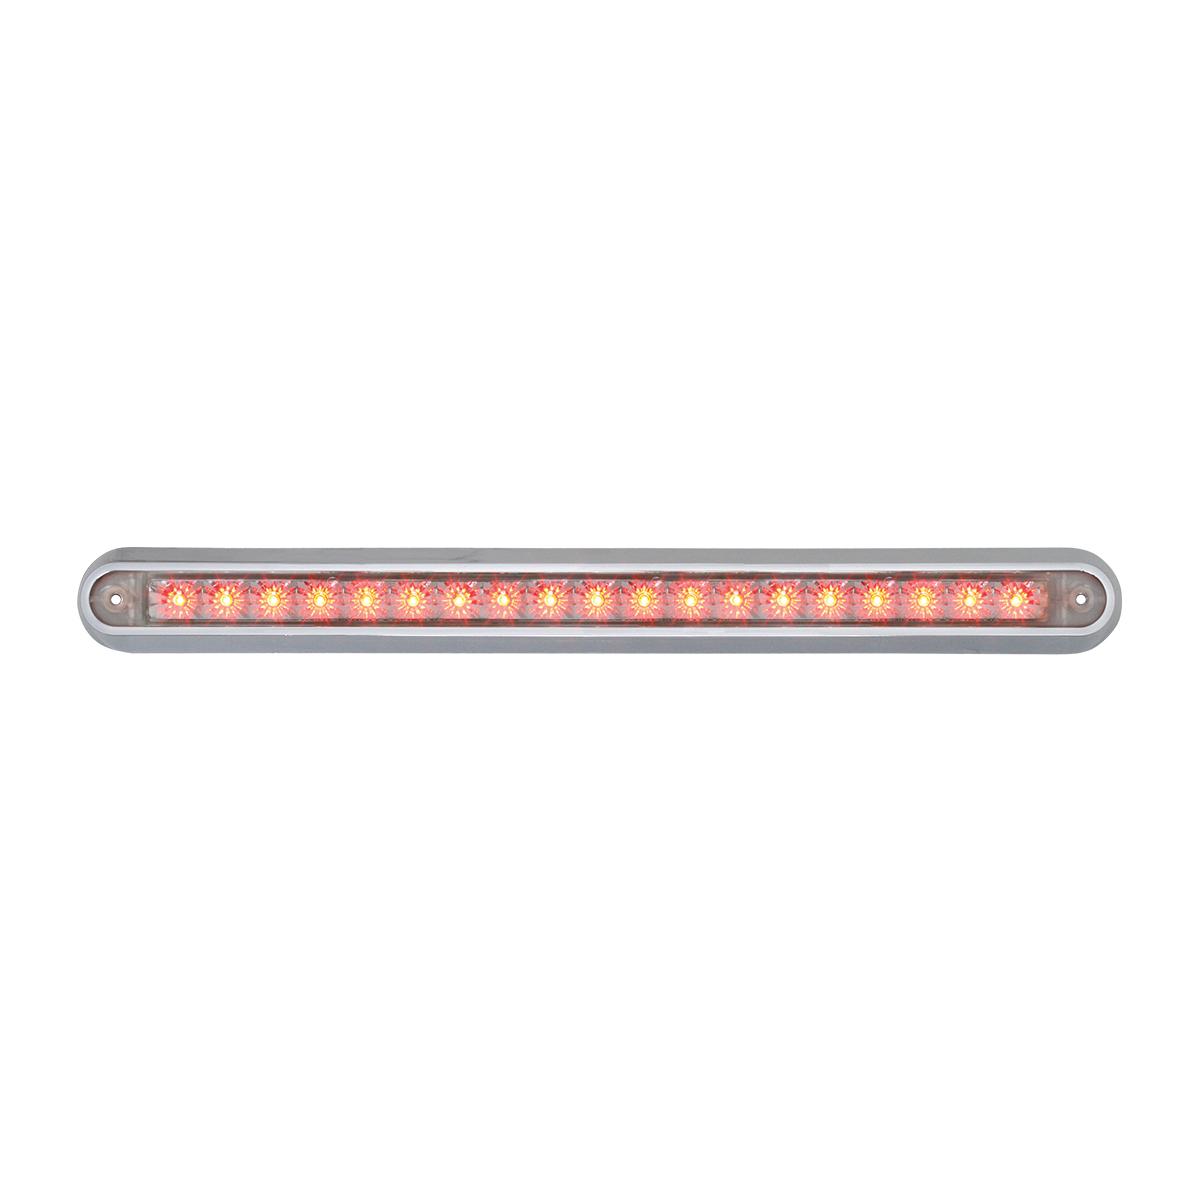 "76296 12"" Surface Mount Light Bar with Chrome Plastic Base"